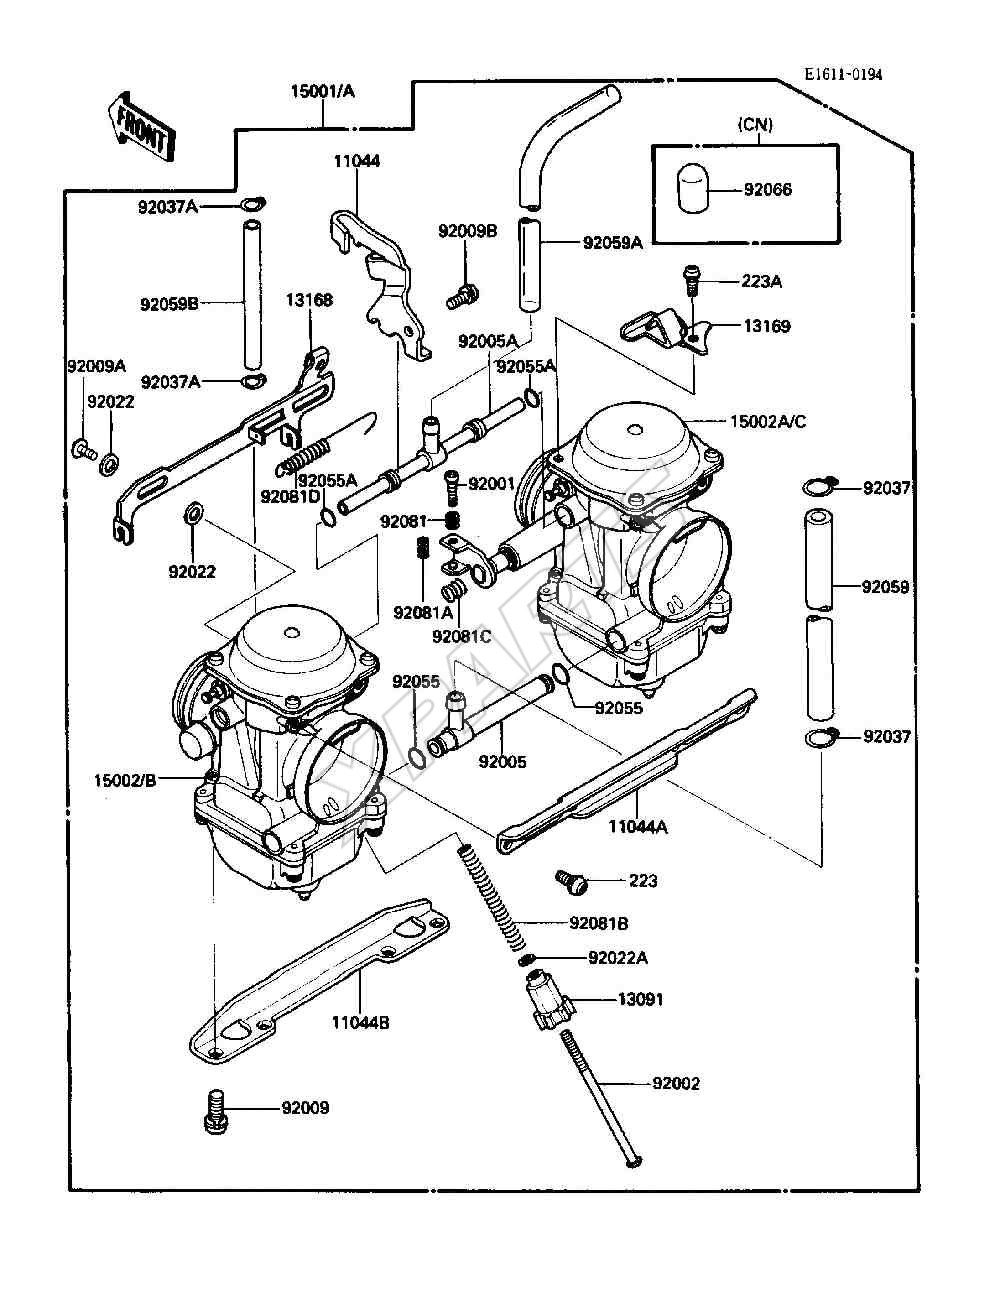 1986 Kawasaki 454 Ltd Wiring Diagram Car Diagrams Explained Images Gallery